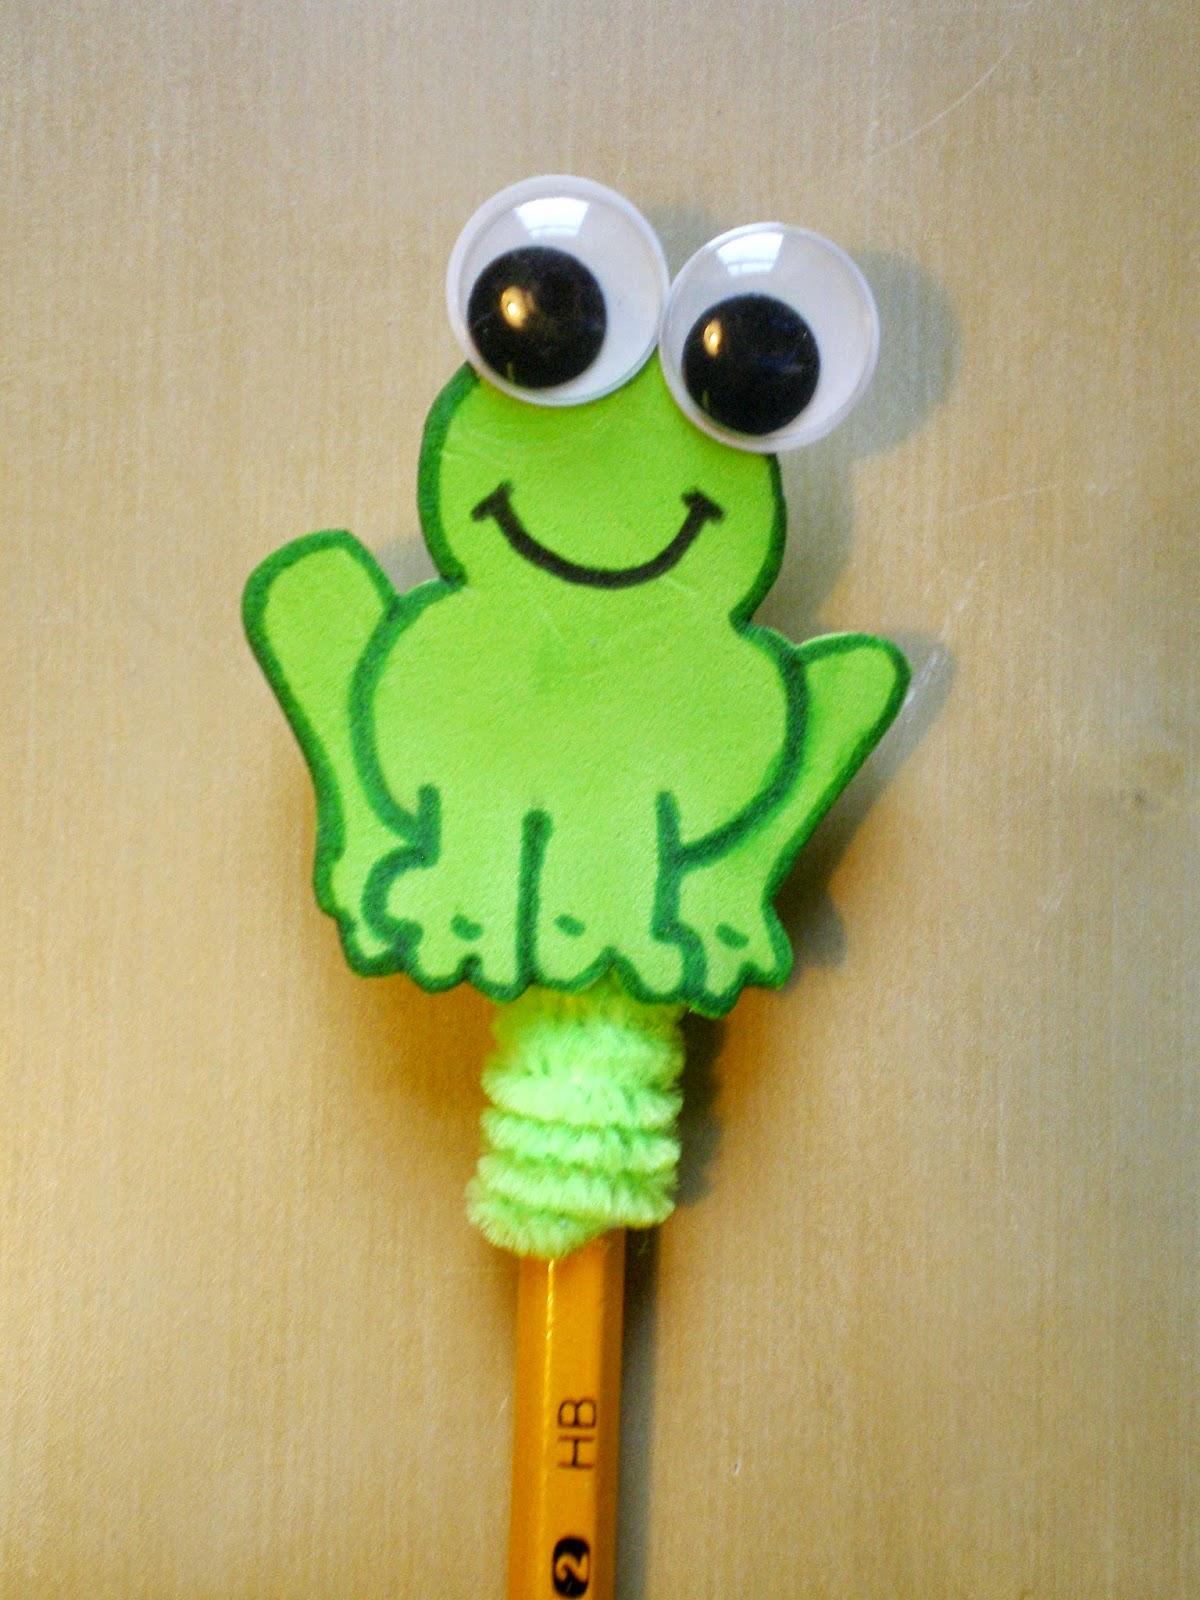 pencil craft ideas for kids ~ Art Craft Gift Ideas